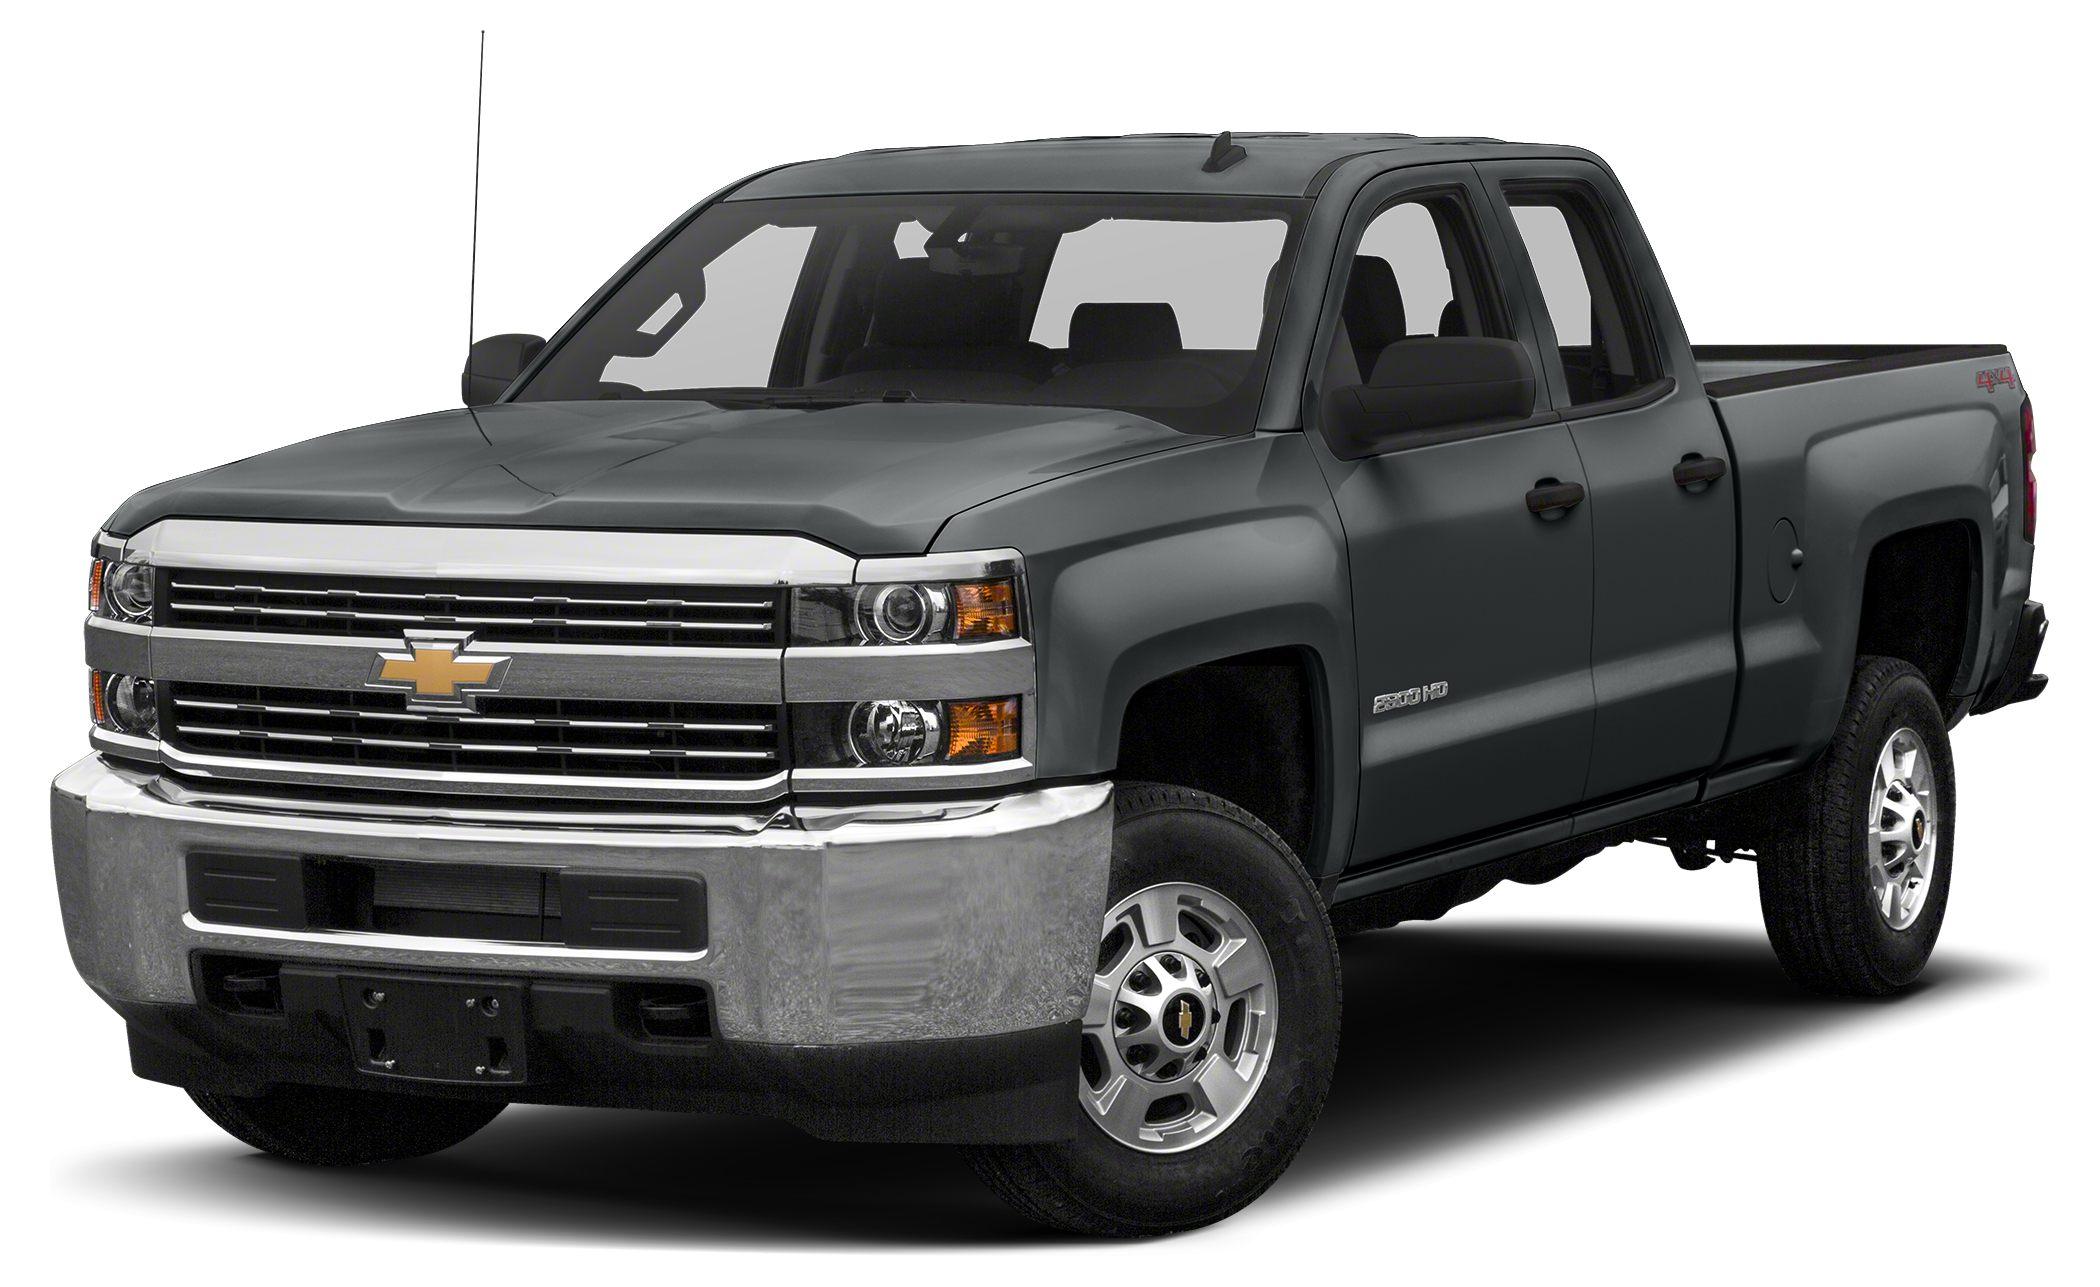 2016 Chevrolet Silverado 2500HD WT Price includes 2500 - Chevrolet Volt Loyalty Private Offer